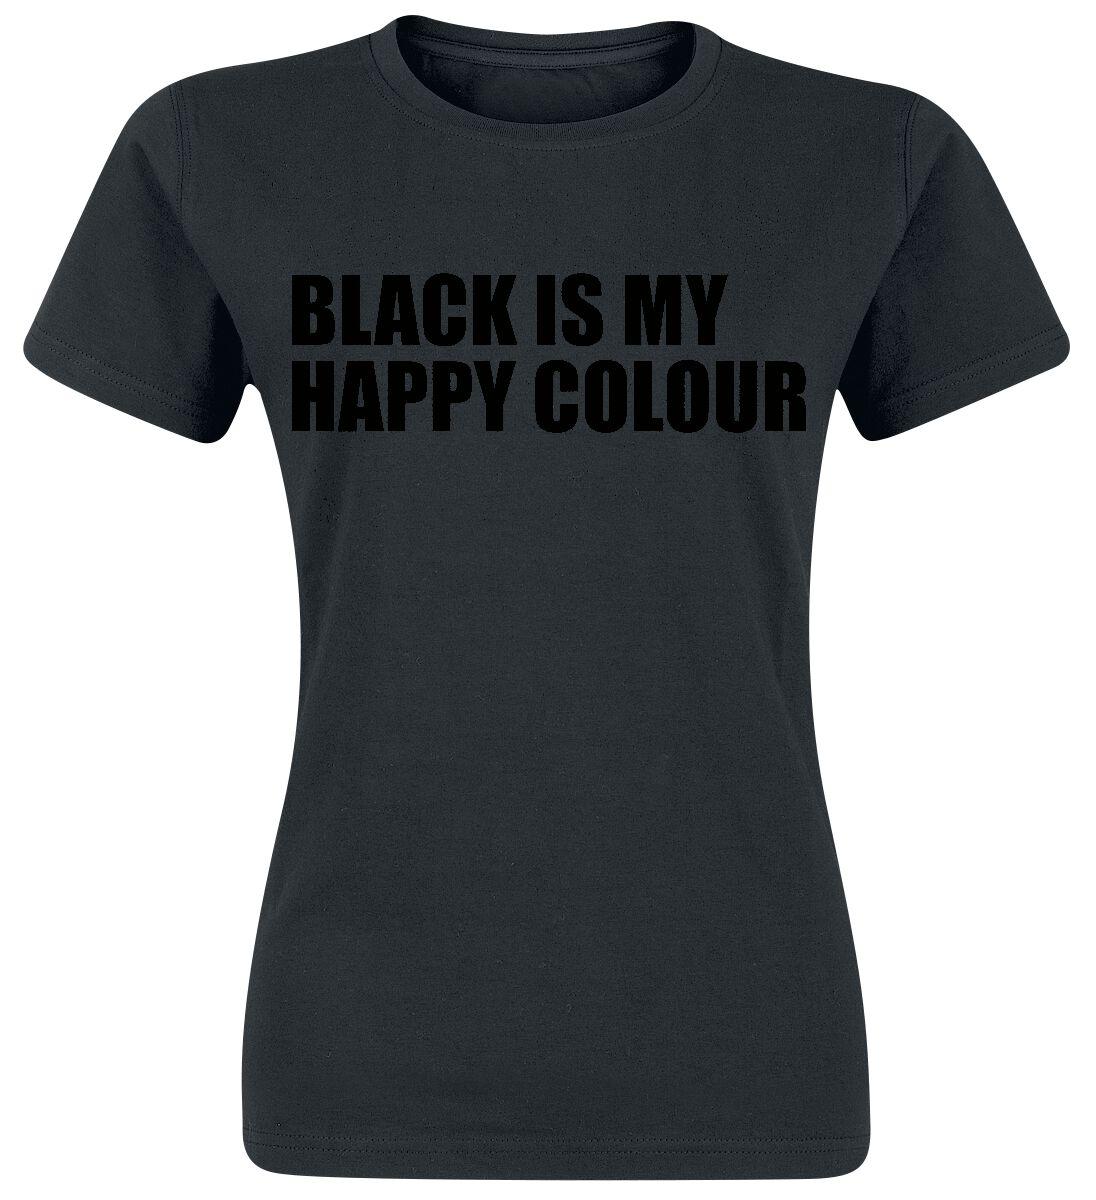 Fun Shirts - Koszulki - Koszulka damska Black Is My Happy Colour Koszulka damska czarny - 336486